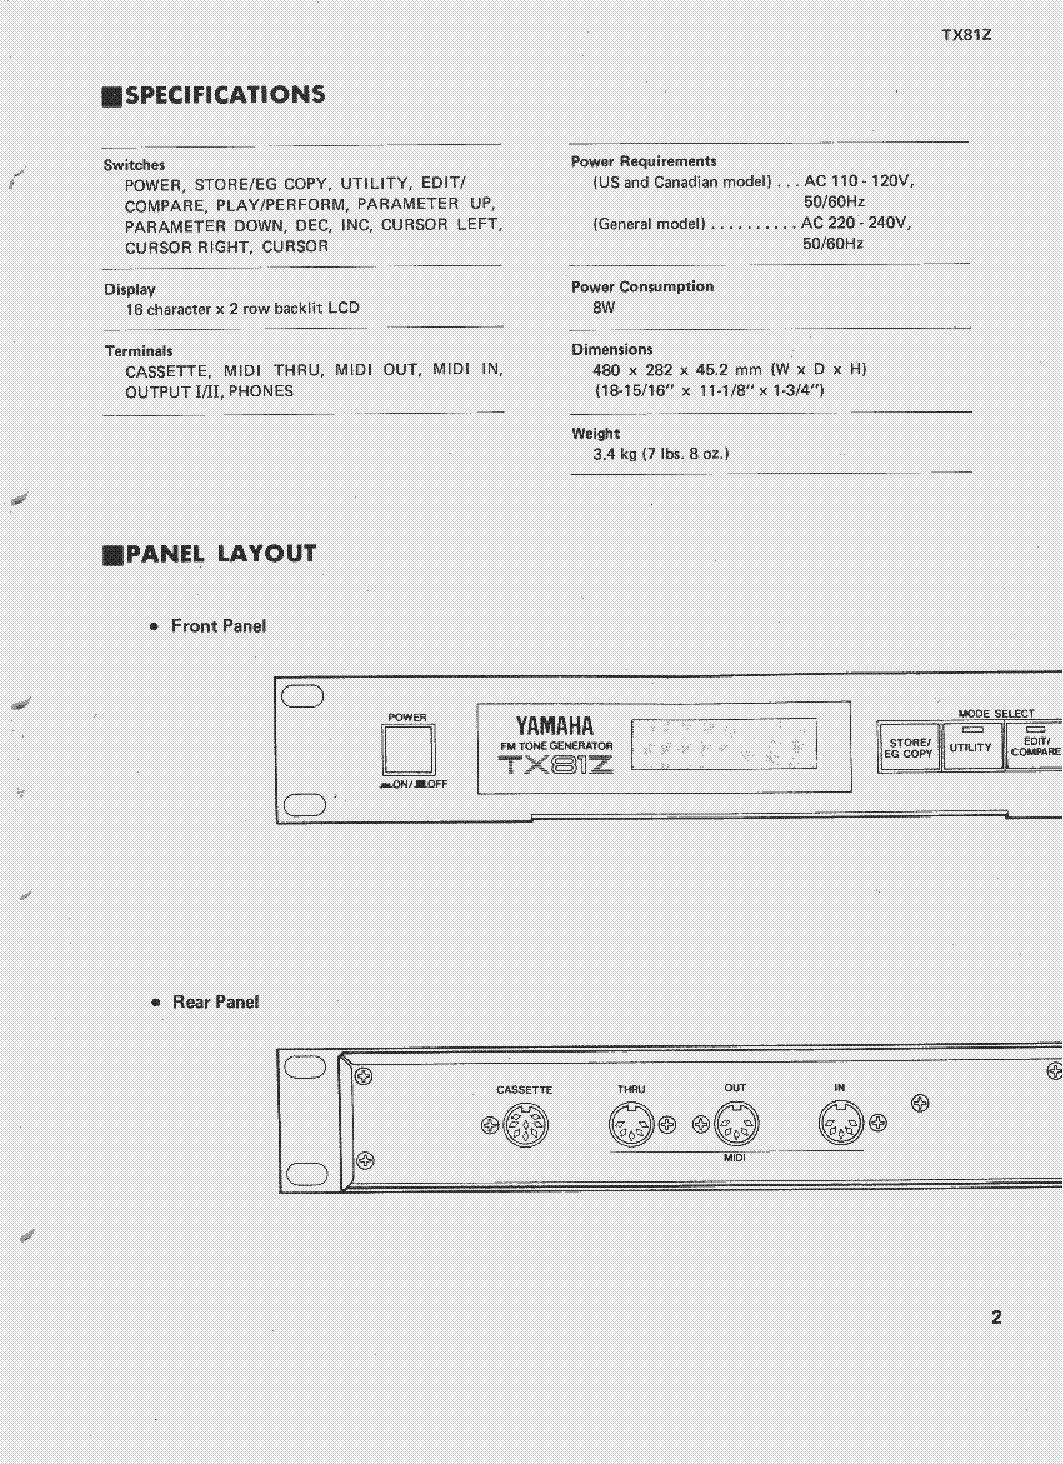 YAMAHA TX81Z SM Service Manual download, schematics, eeprom, repair